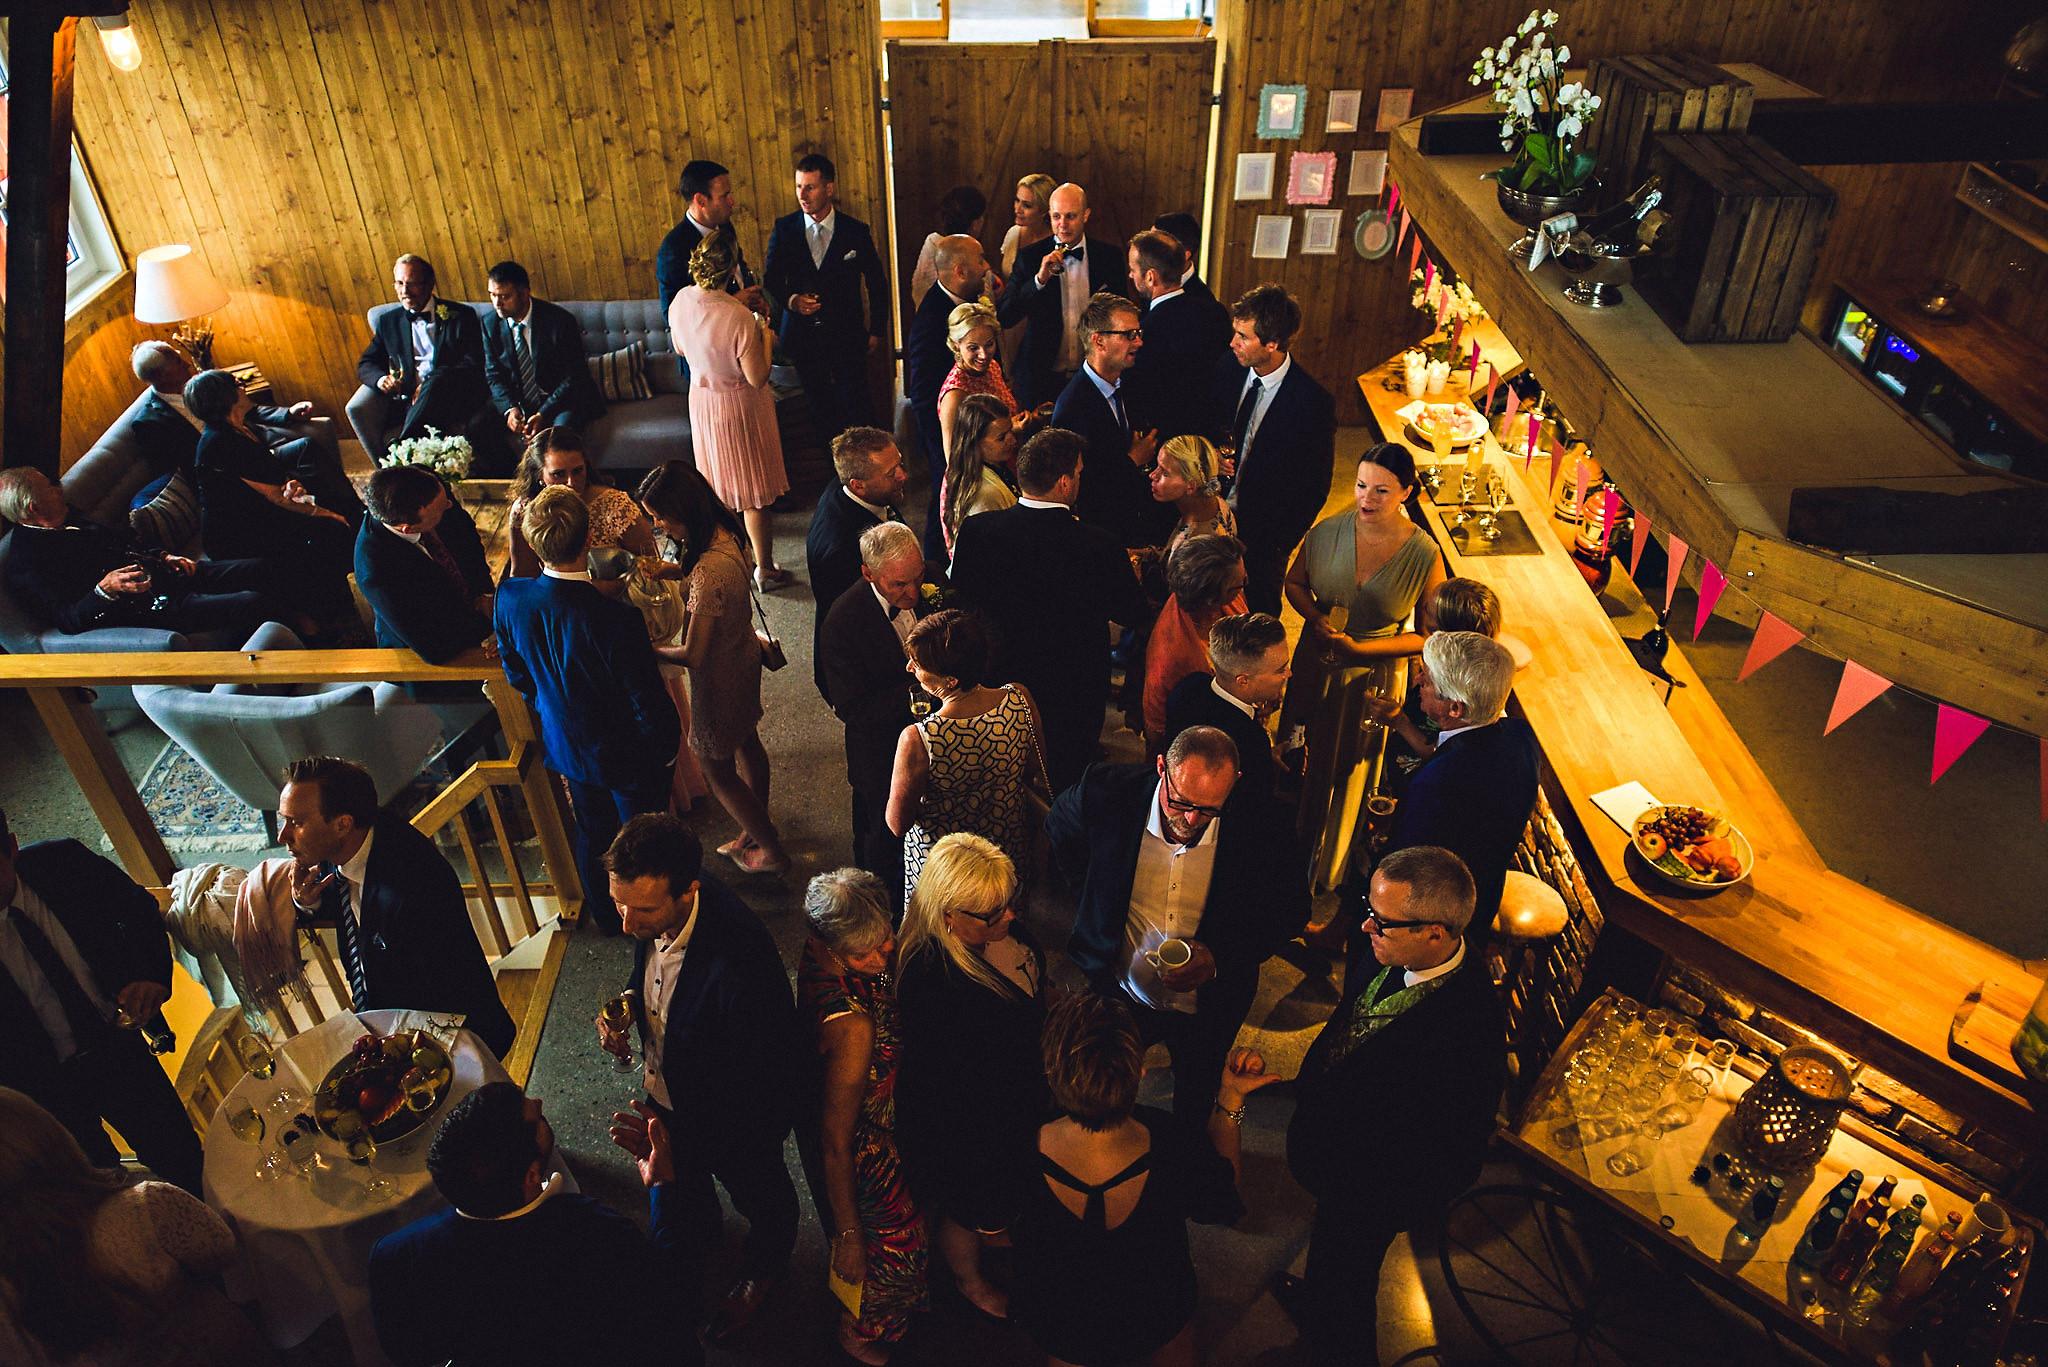 Bryllup på Solastranden Gård fotograf Eirik Halvorsen-27.jpg